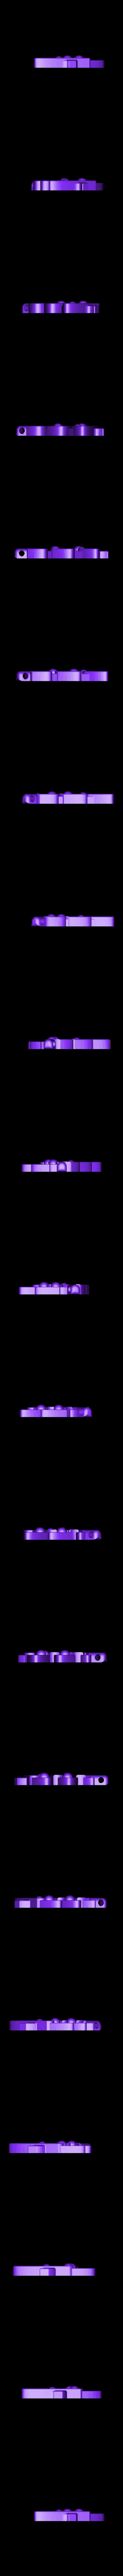 Pendant christmas 2.STL Download STL file Christmas pendant • 3D print model, Majs84